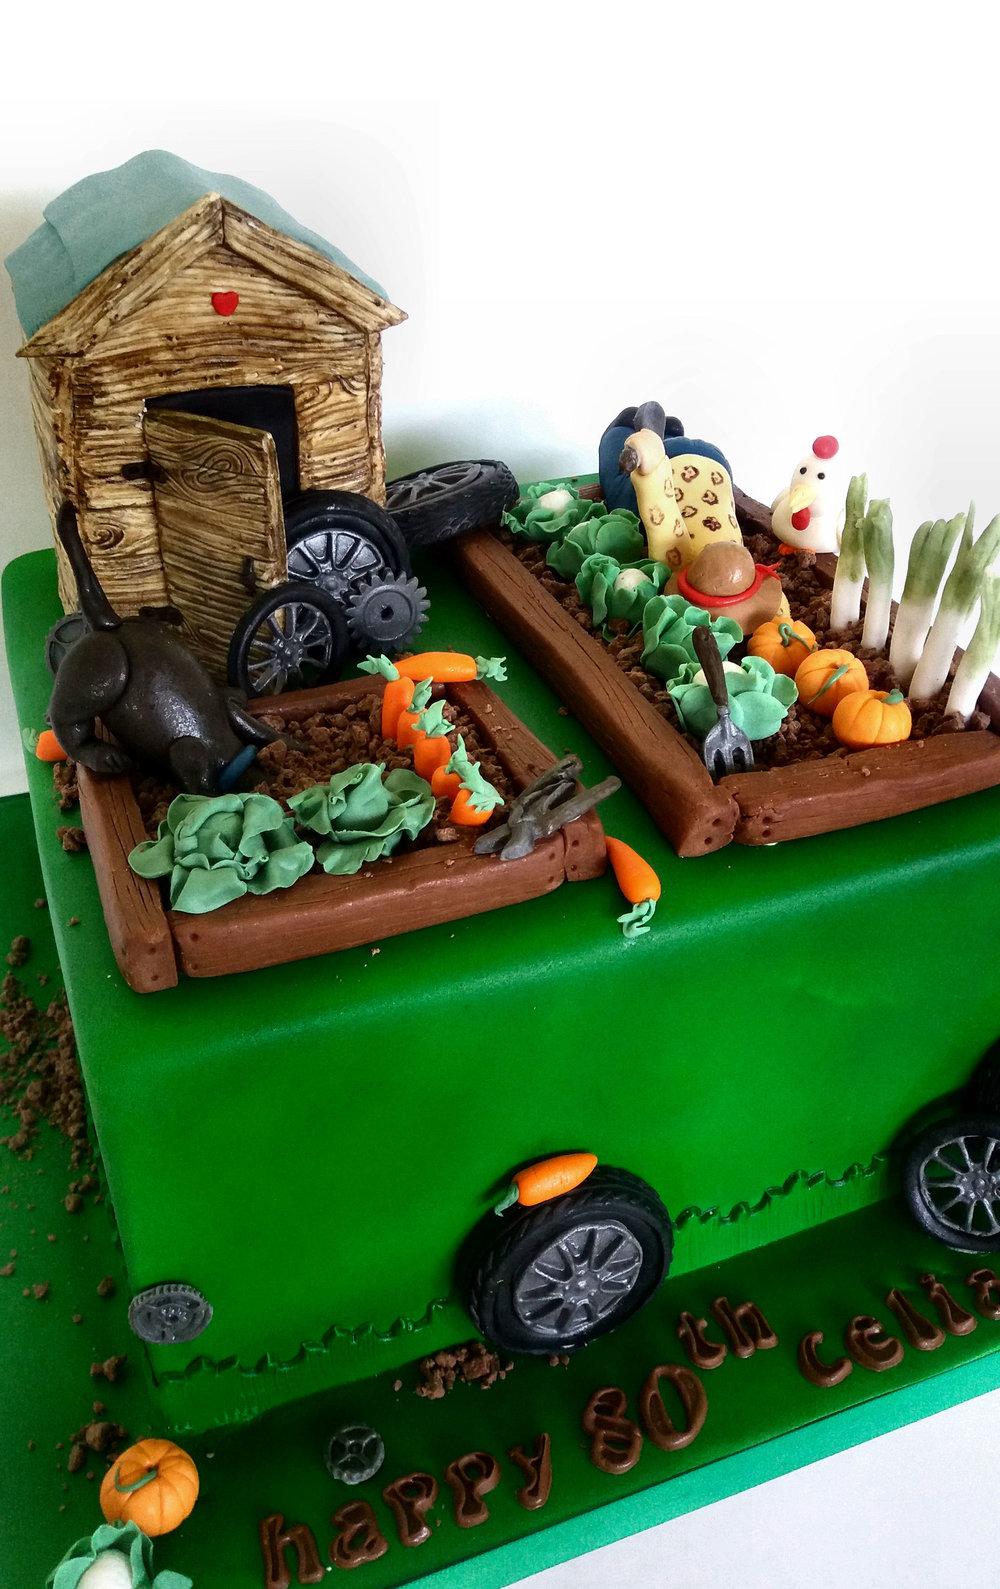 gardening cake.jpg